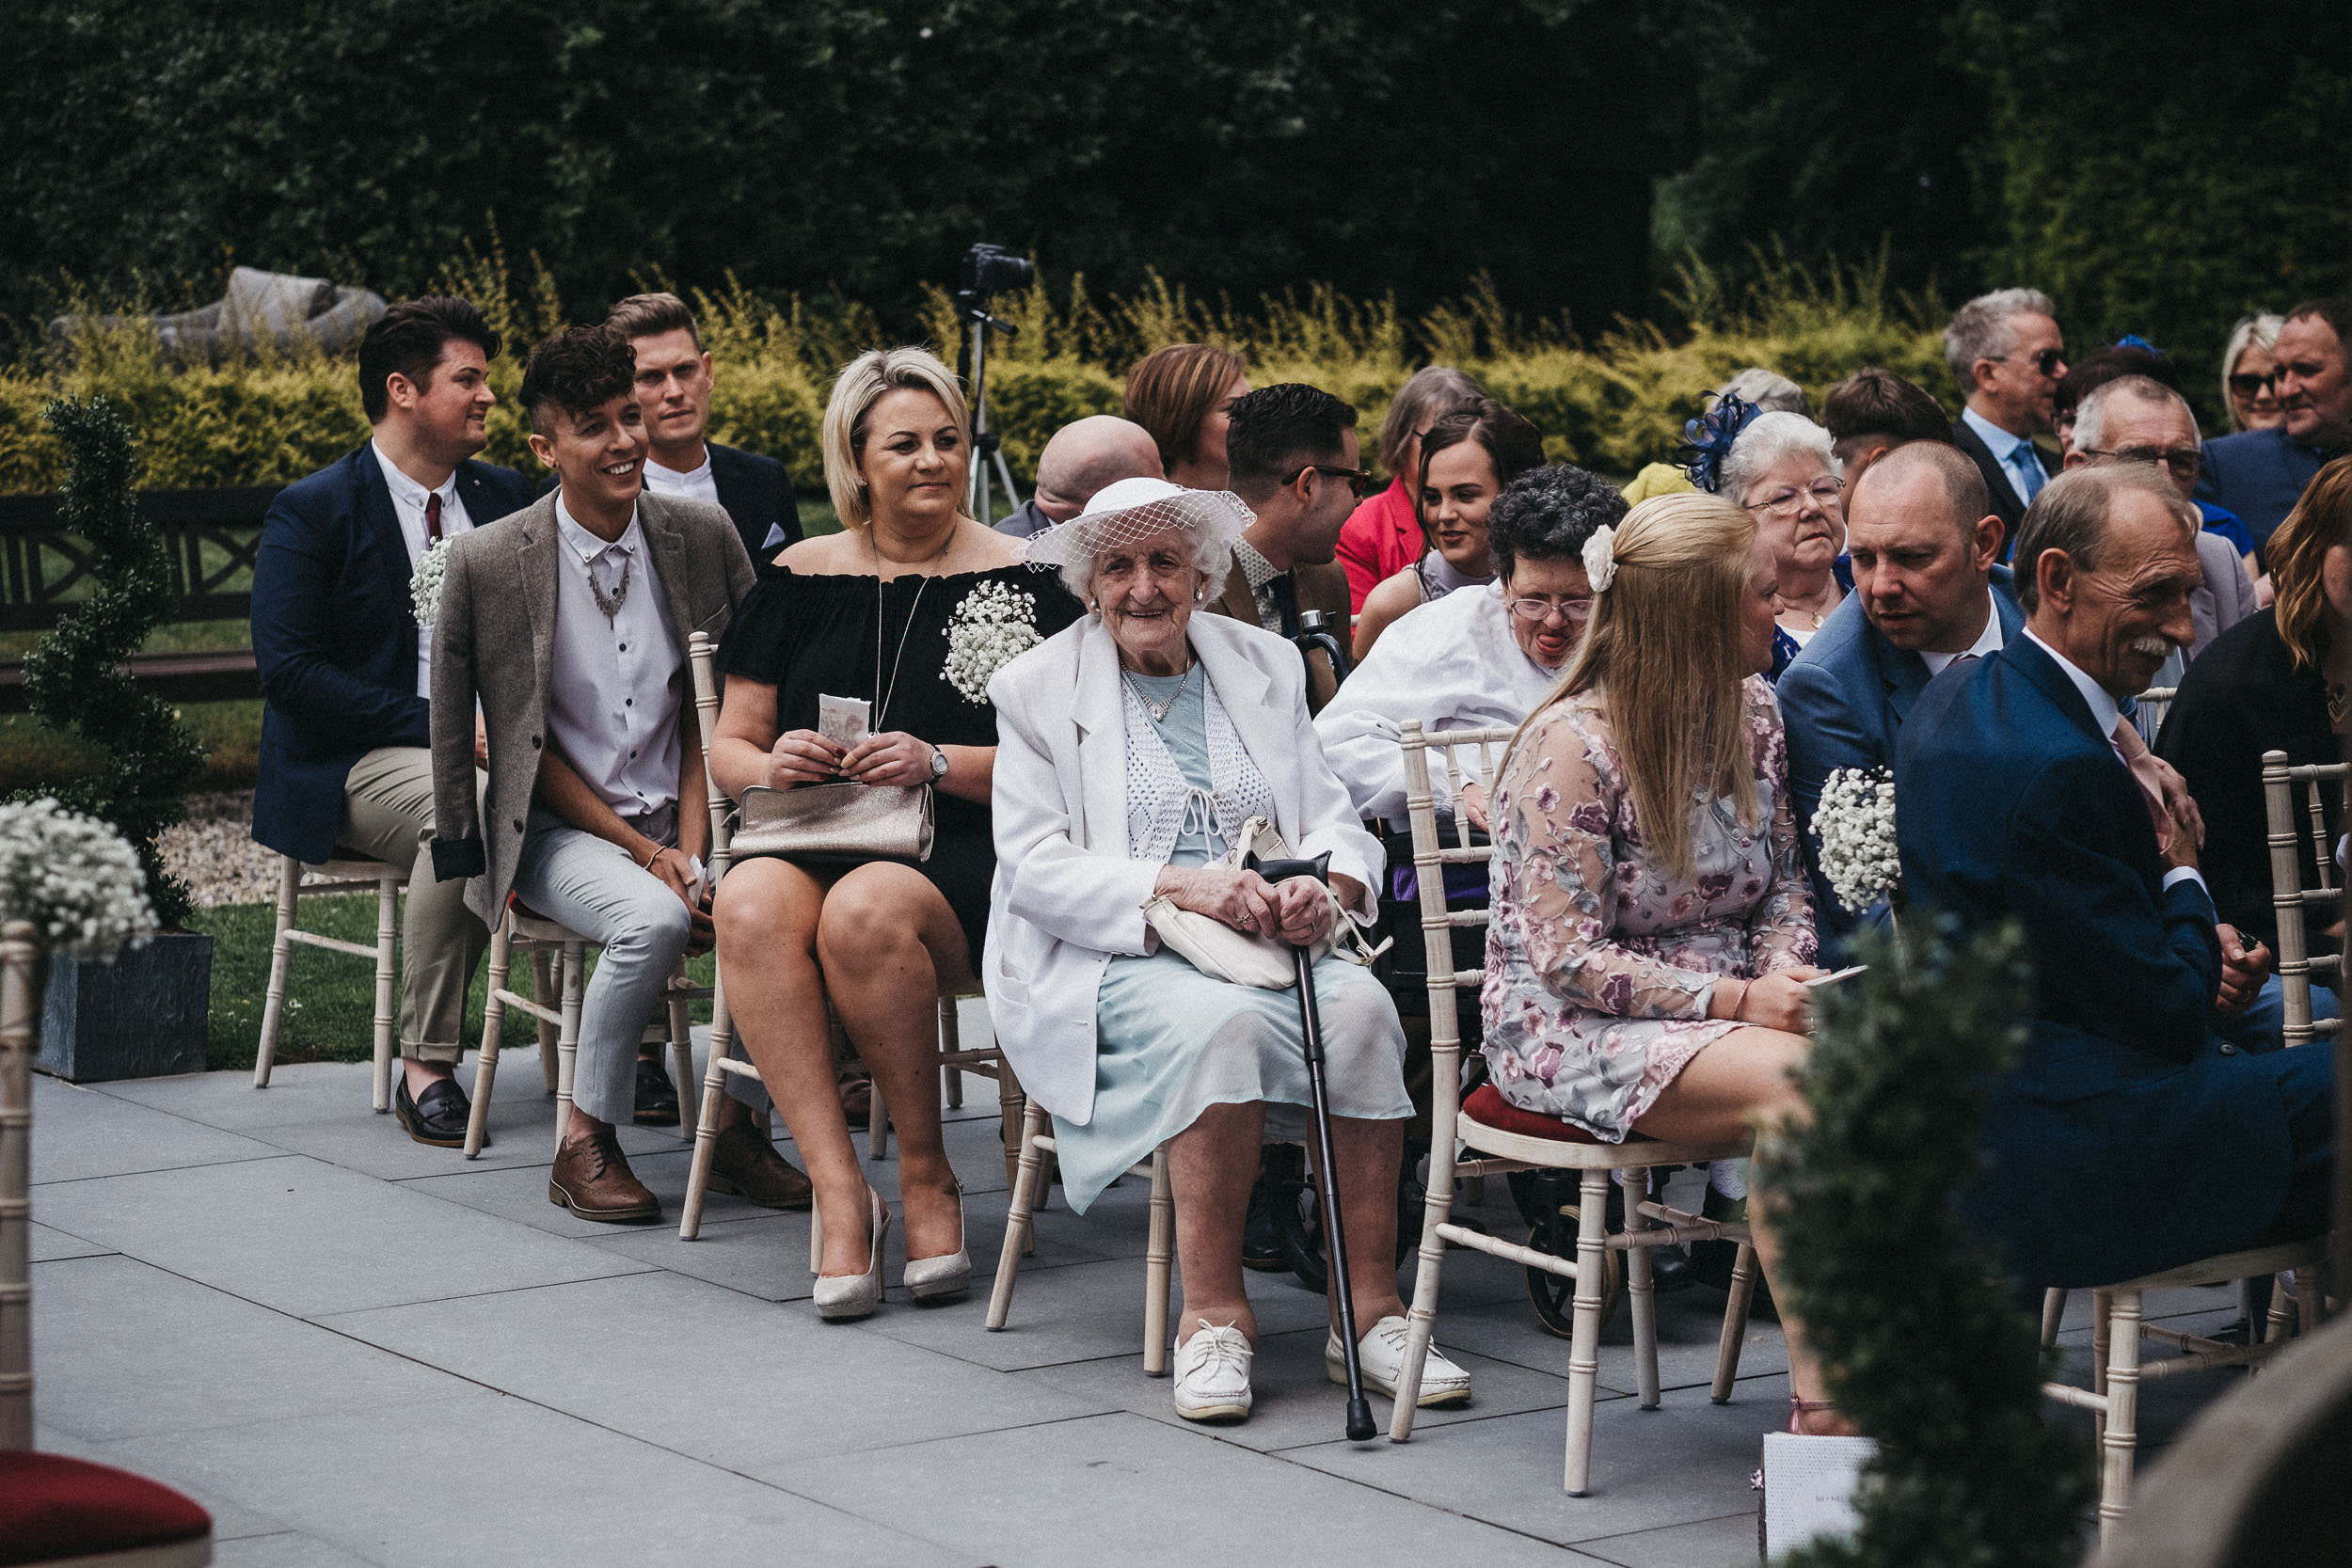 Guests watch outdoor wedding ceremony